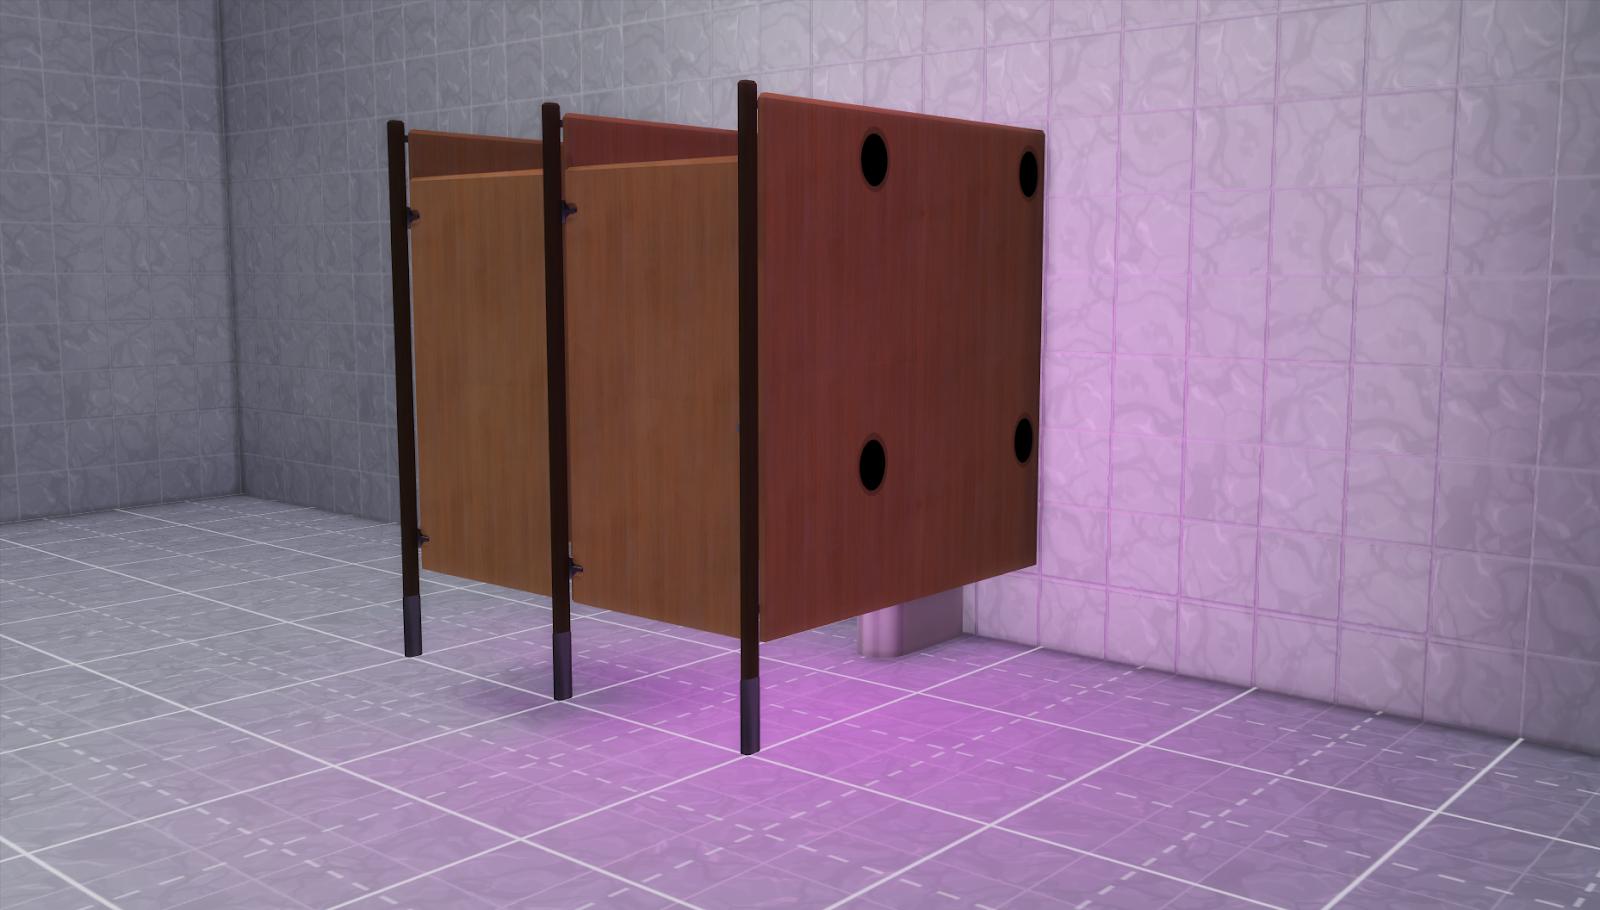 0-Positiv - toilet stall - WickedWhims - LoversLab